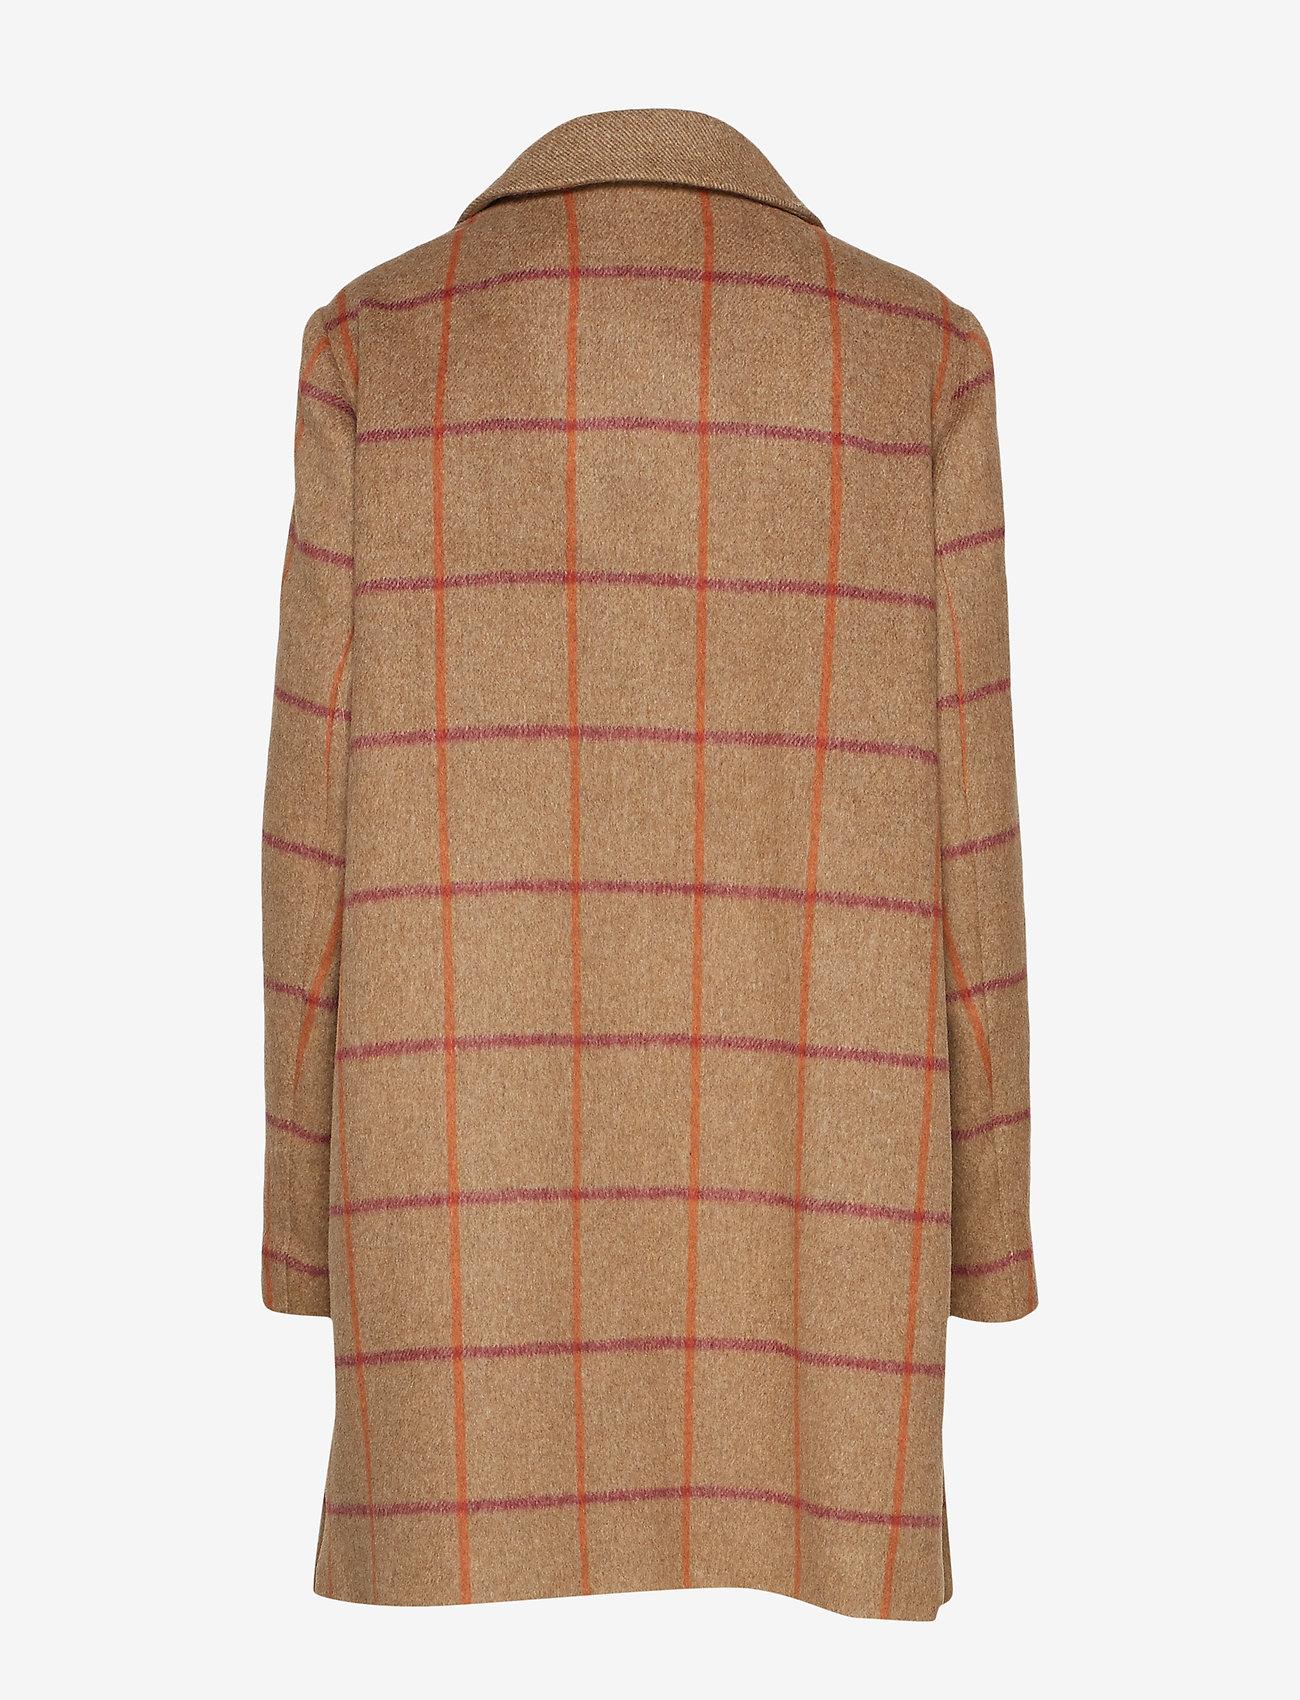 Coat Wool (Check Camel) - Gerry Weber Edition zQ7xln